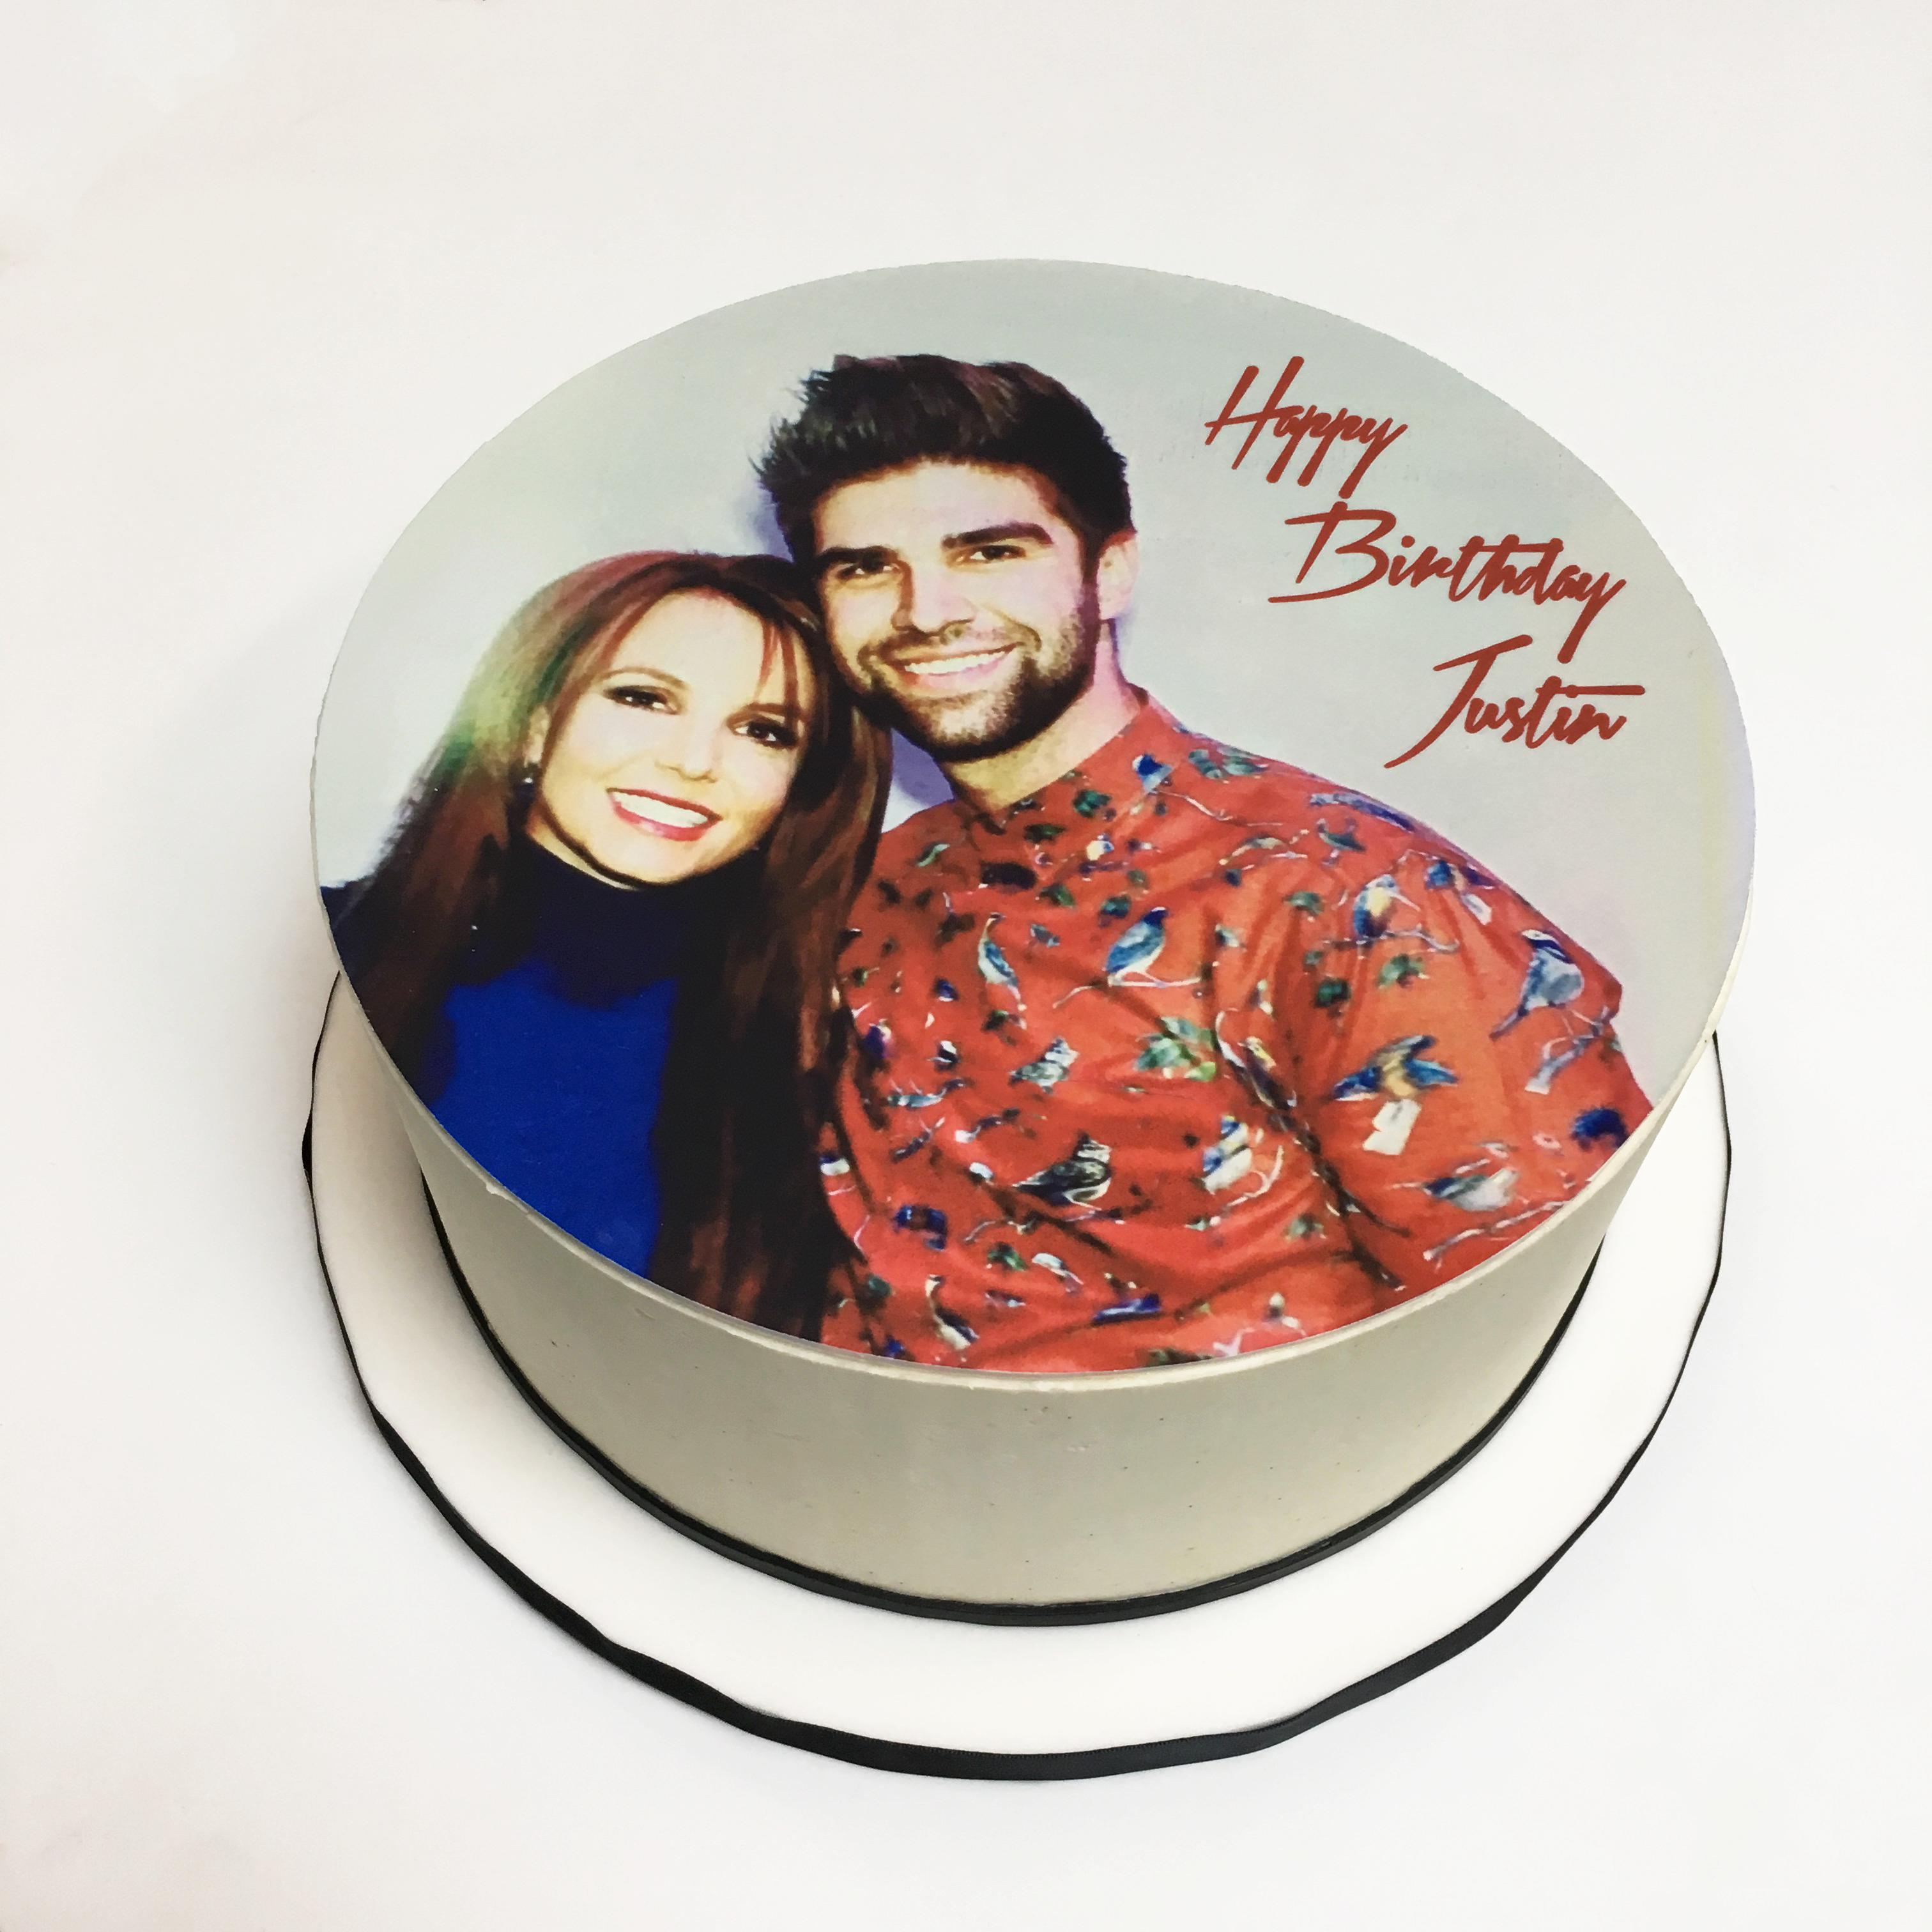 Justin's Edible Print Cake